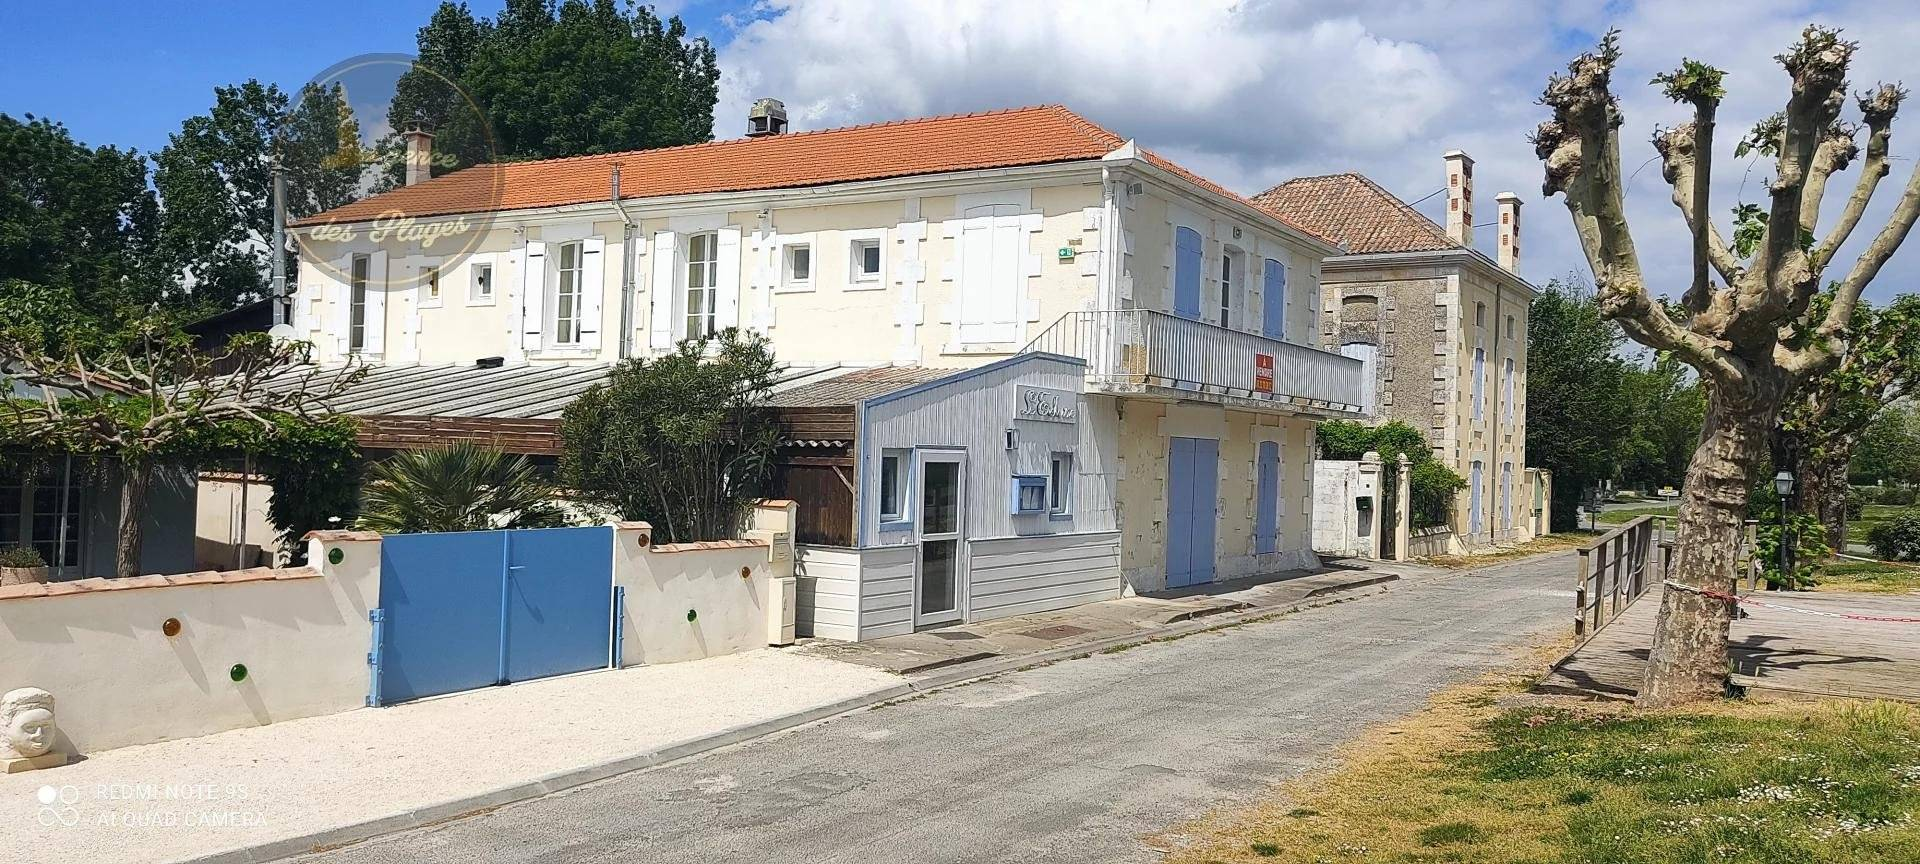 1 18 Saint-Fort-sur-Gironde